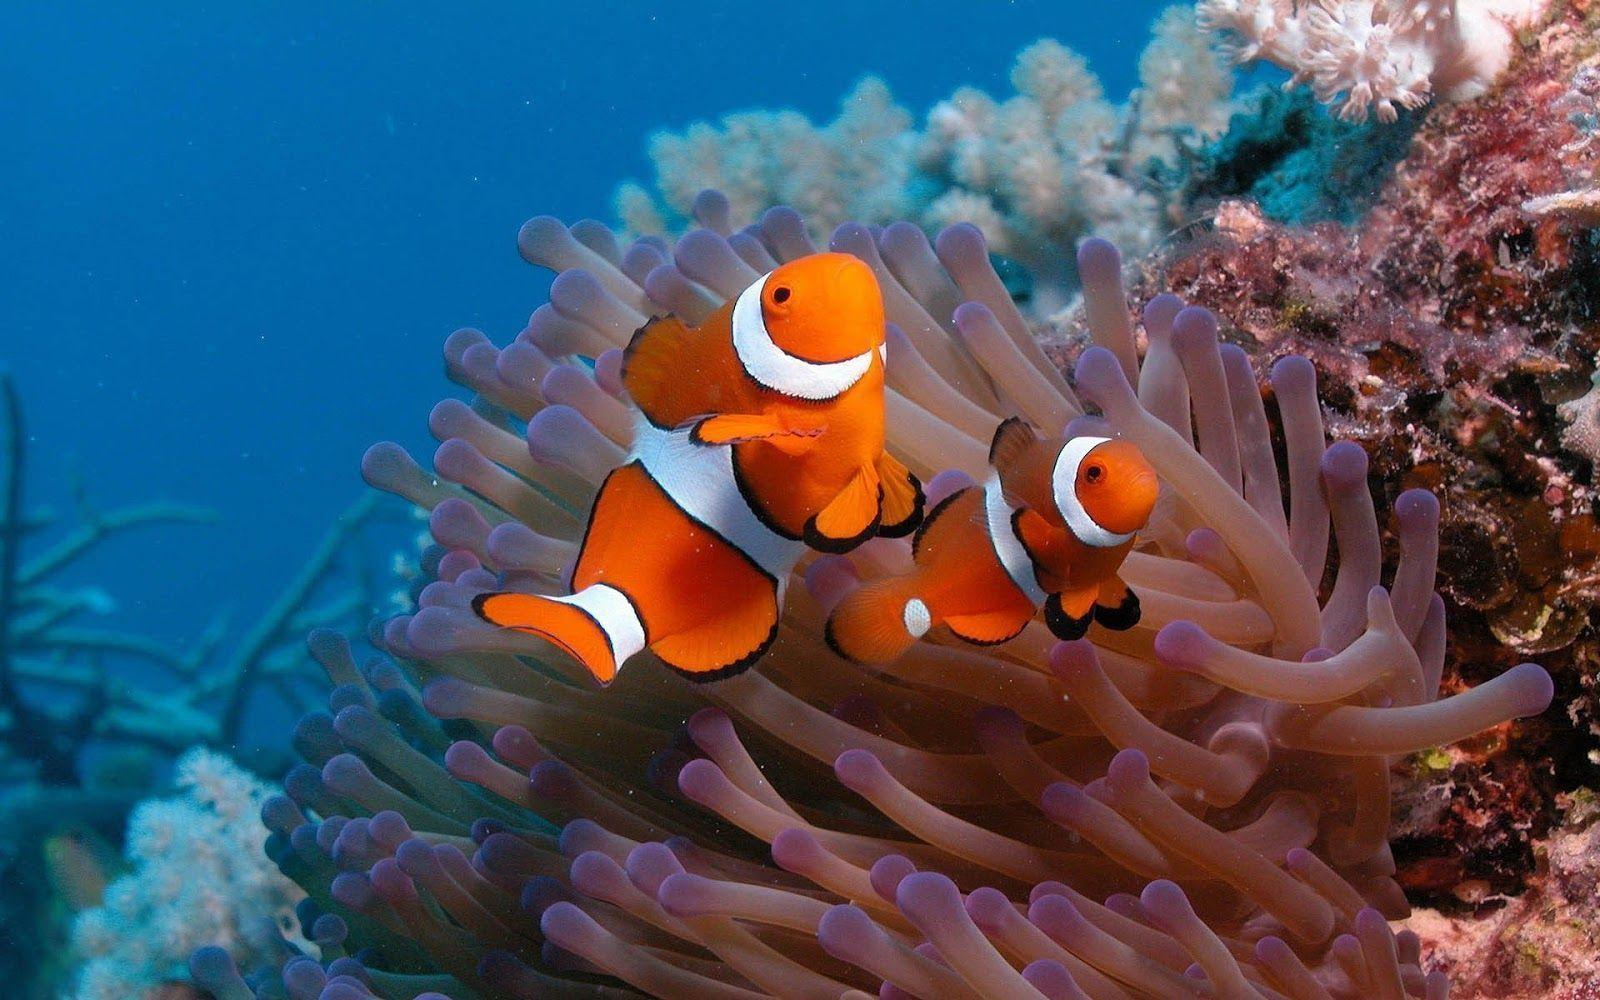 Clown Fish On The Ocean Floor